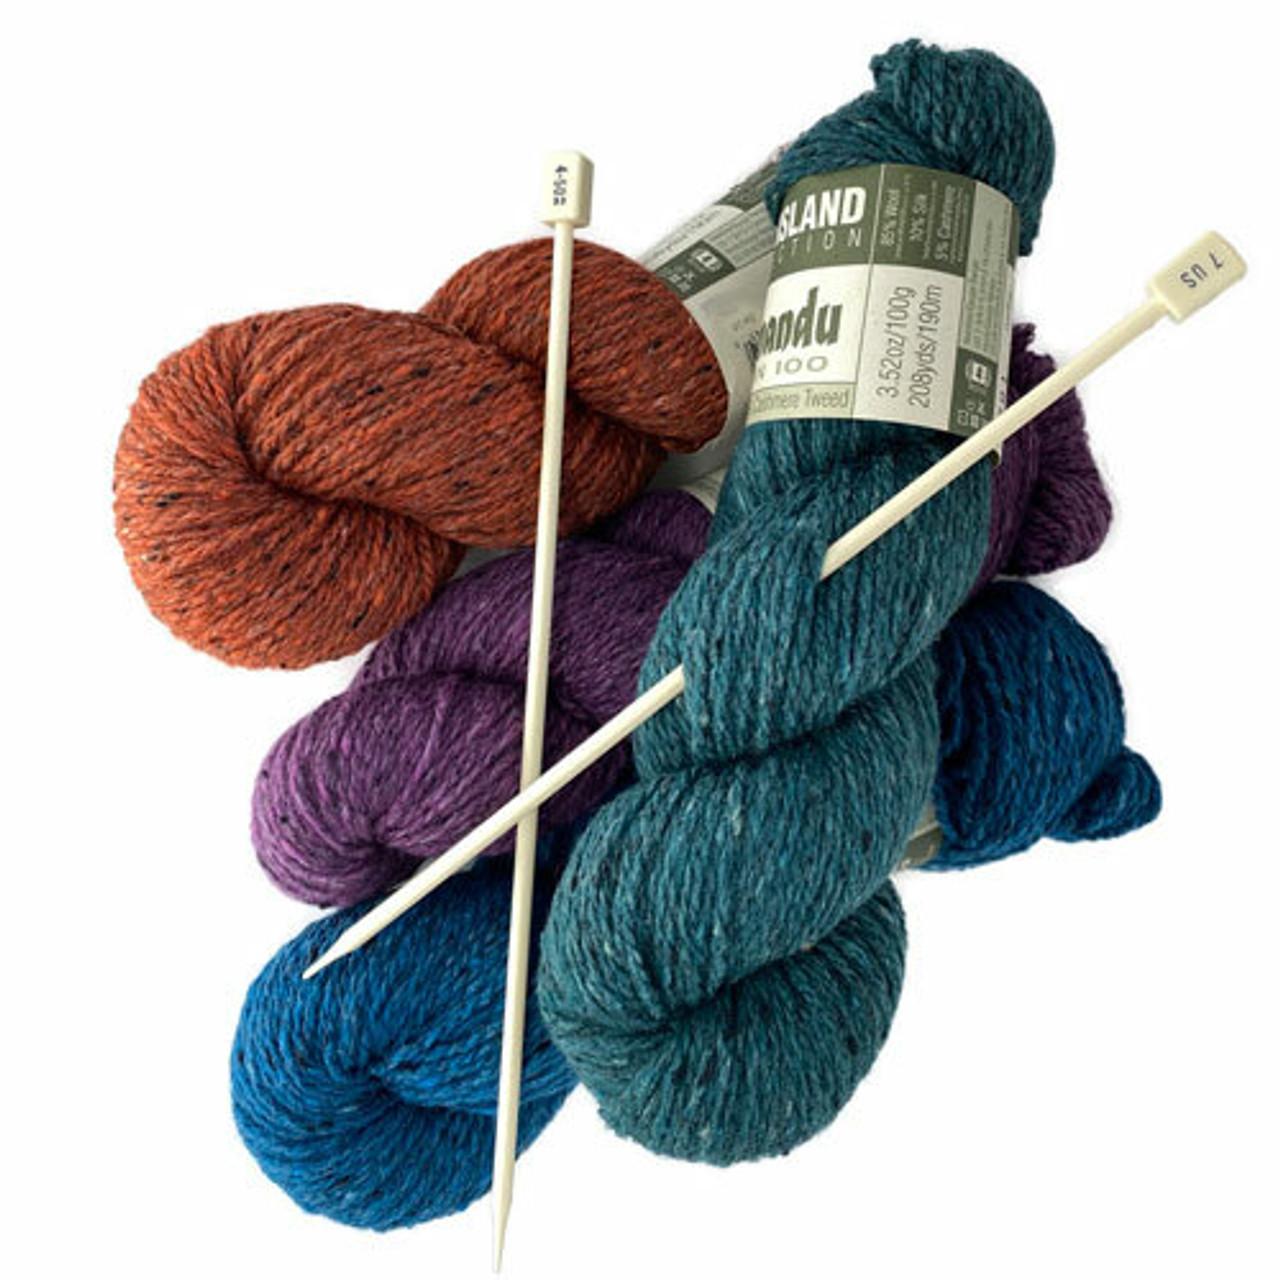 Single Point Knitting Needles at the Yarn Store